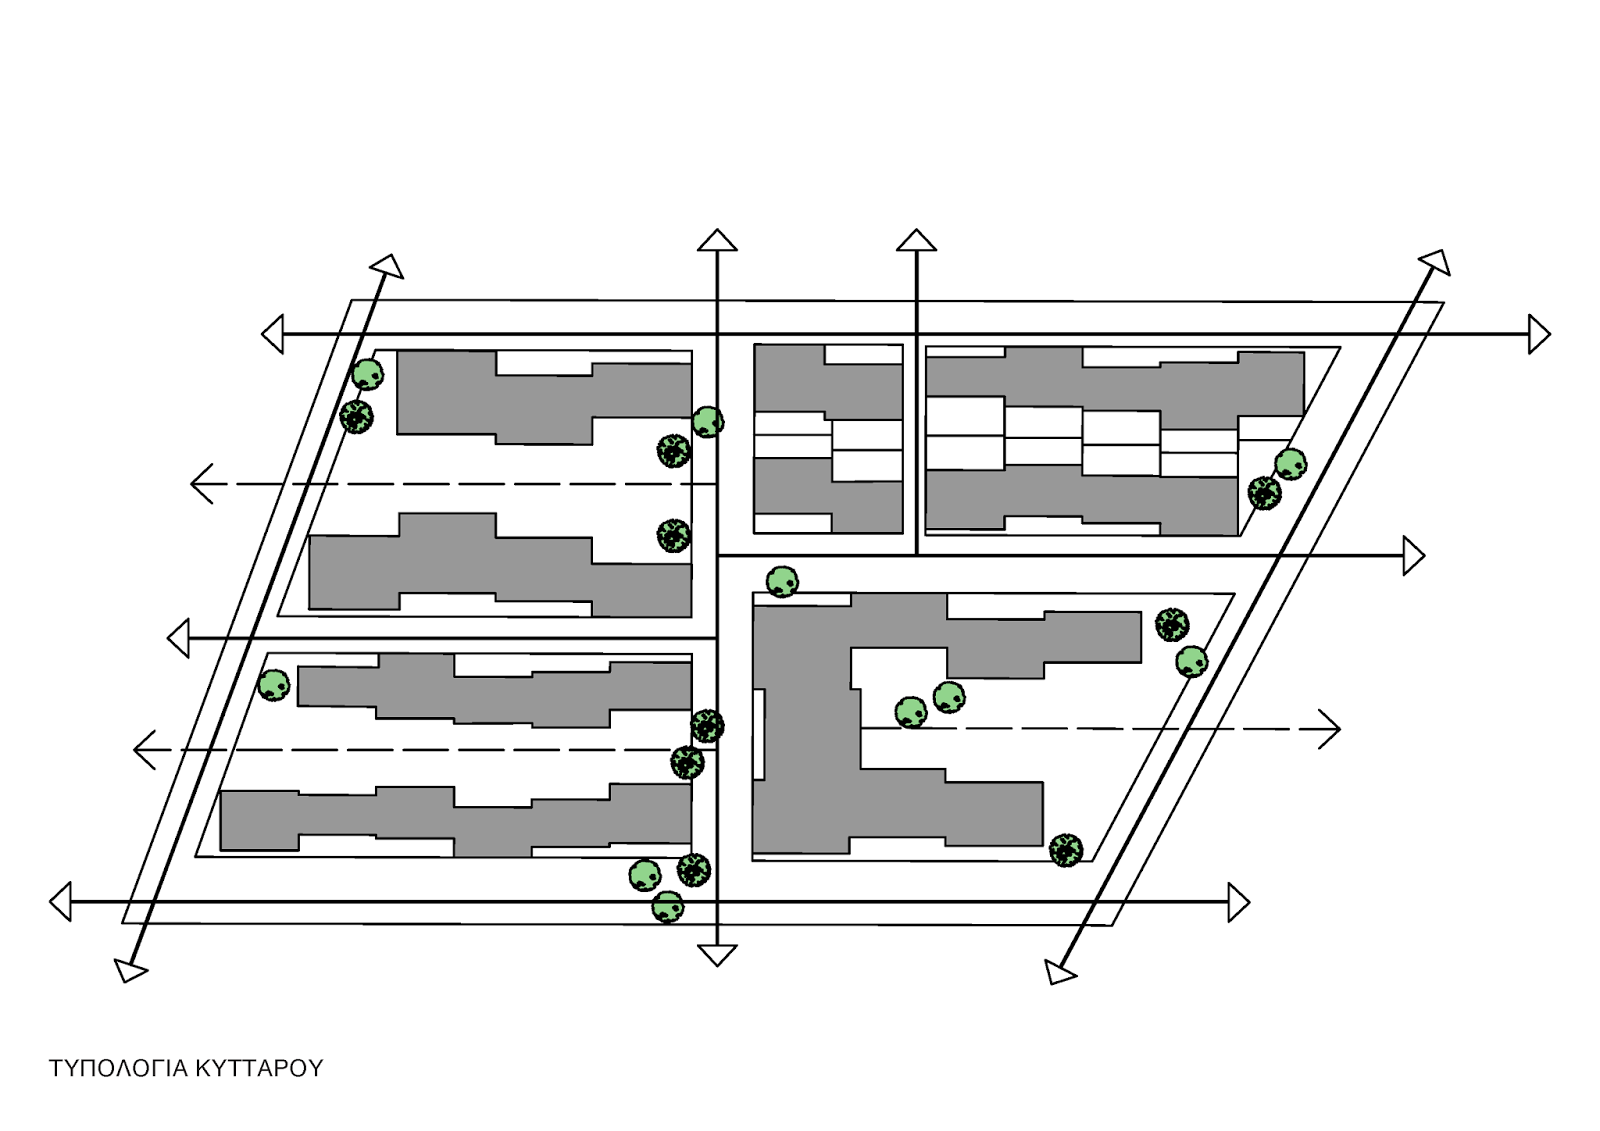 Berühmt L14 20 Schaltplan Fotos - Elektrische Schaltplan-Ideen ...